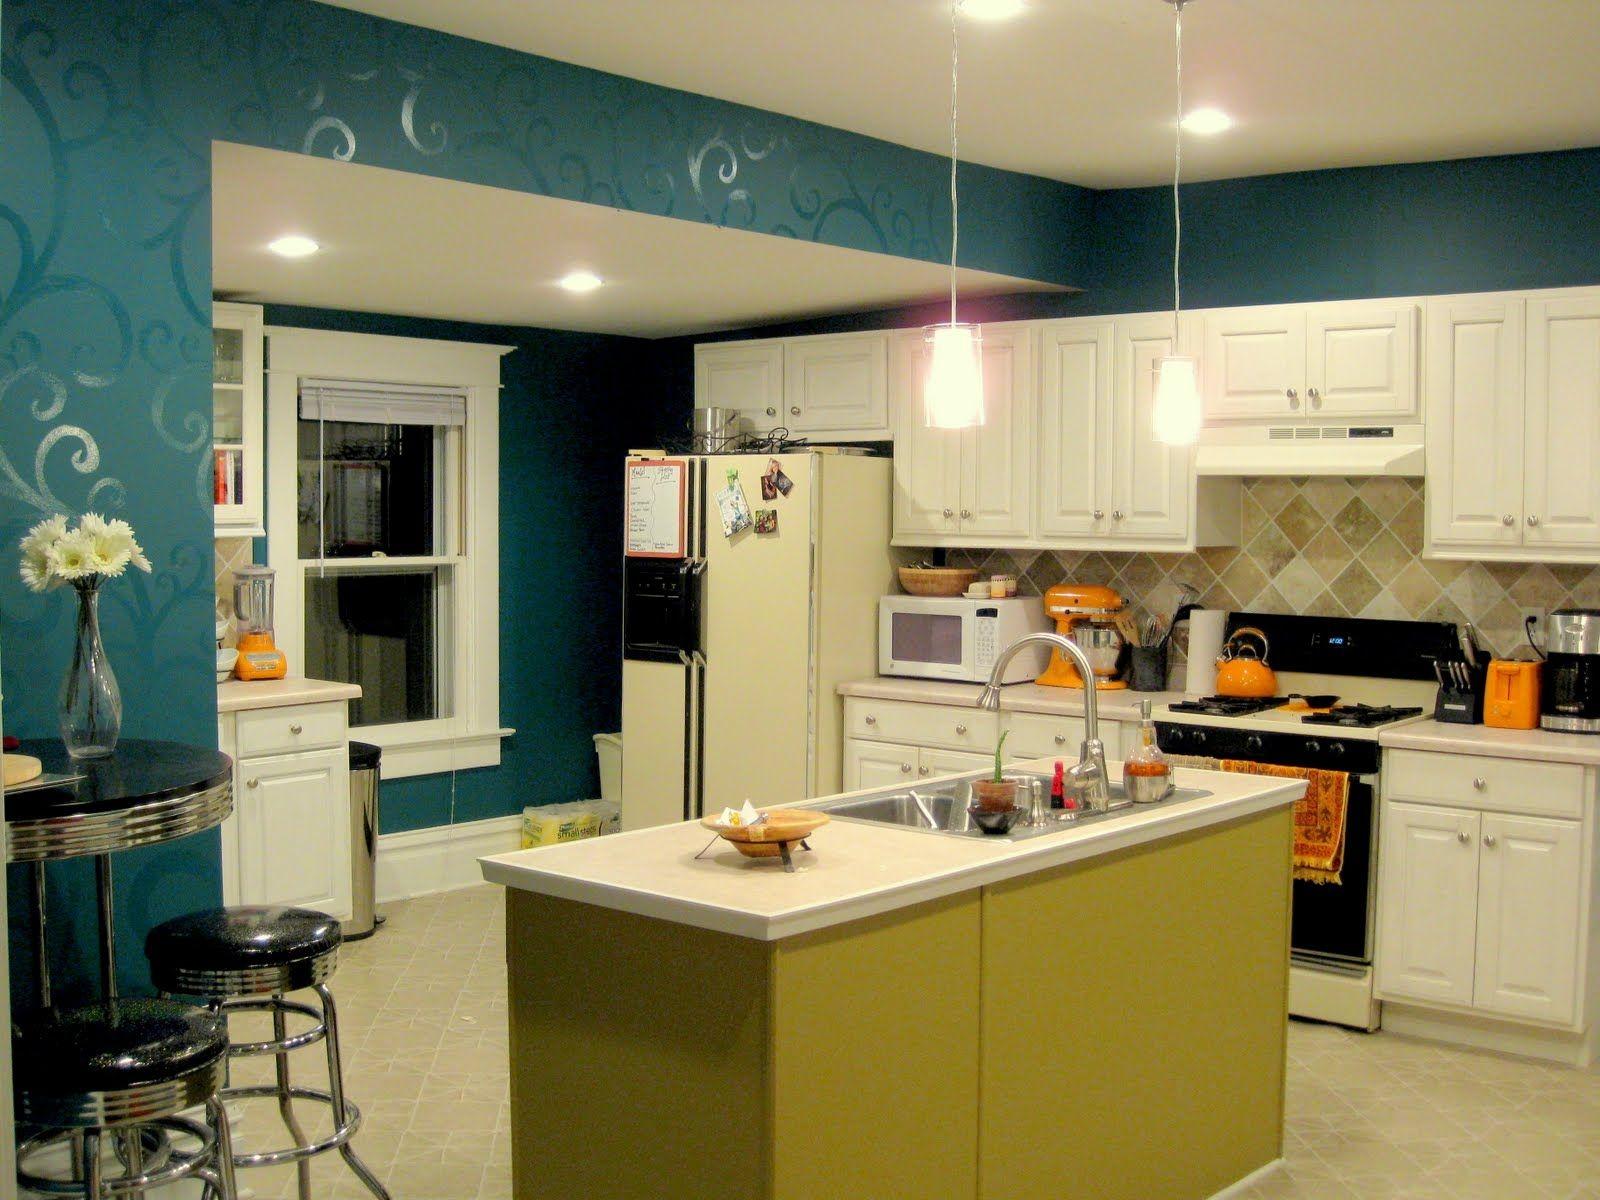 Kitchen Design Wall Color Ideas | http://yonkou-tei.net | Pinterest ...